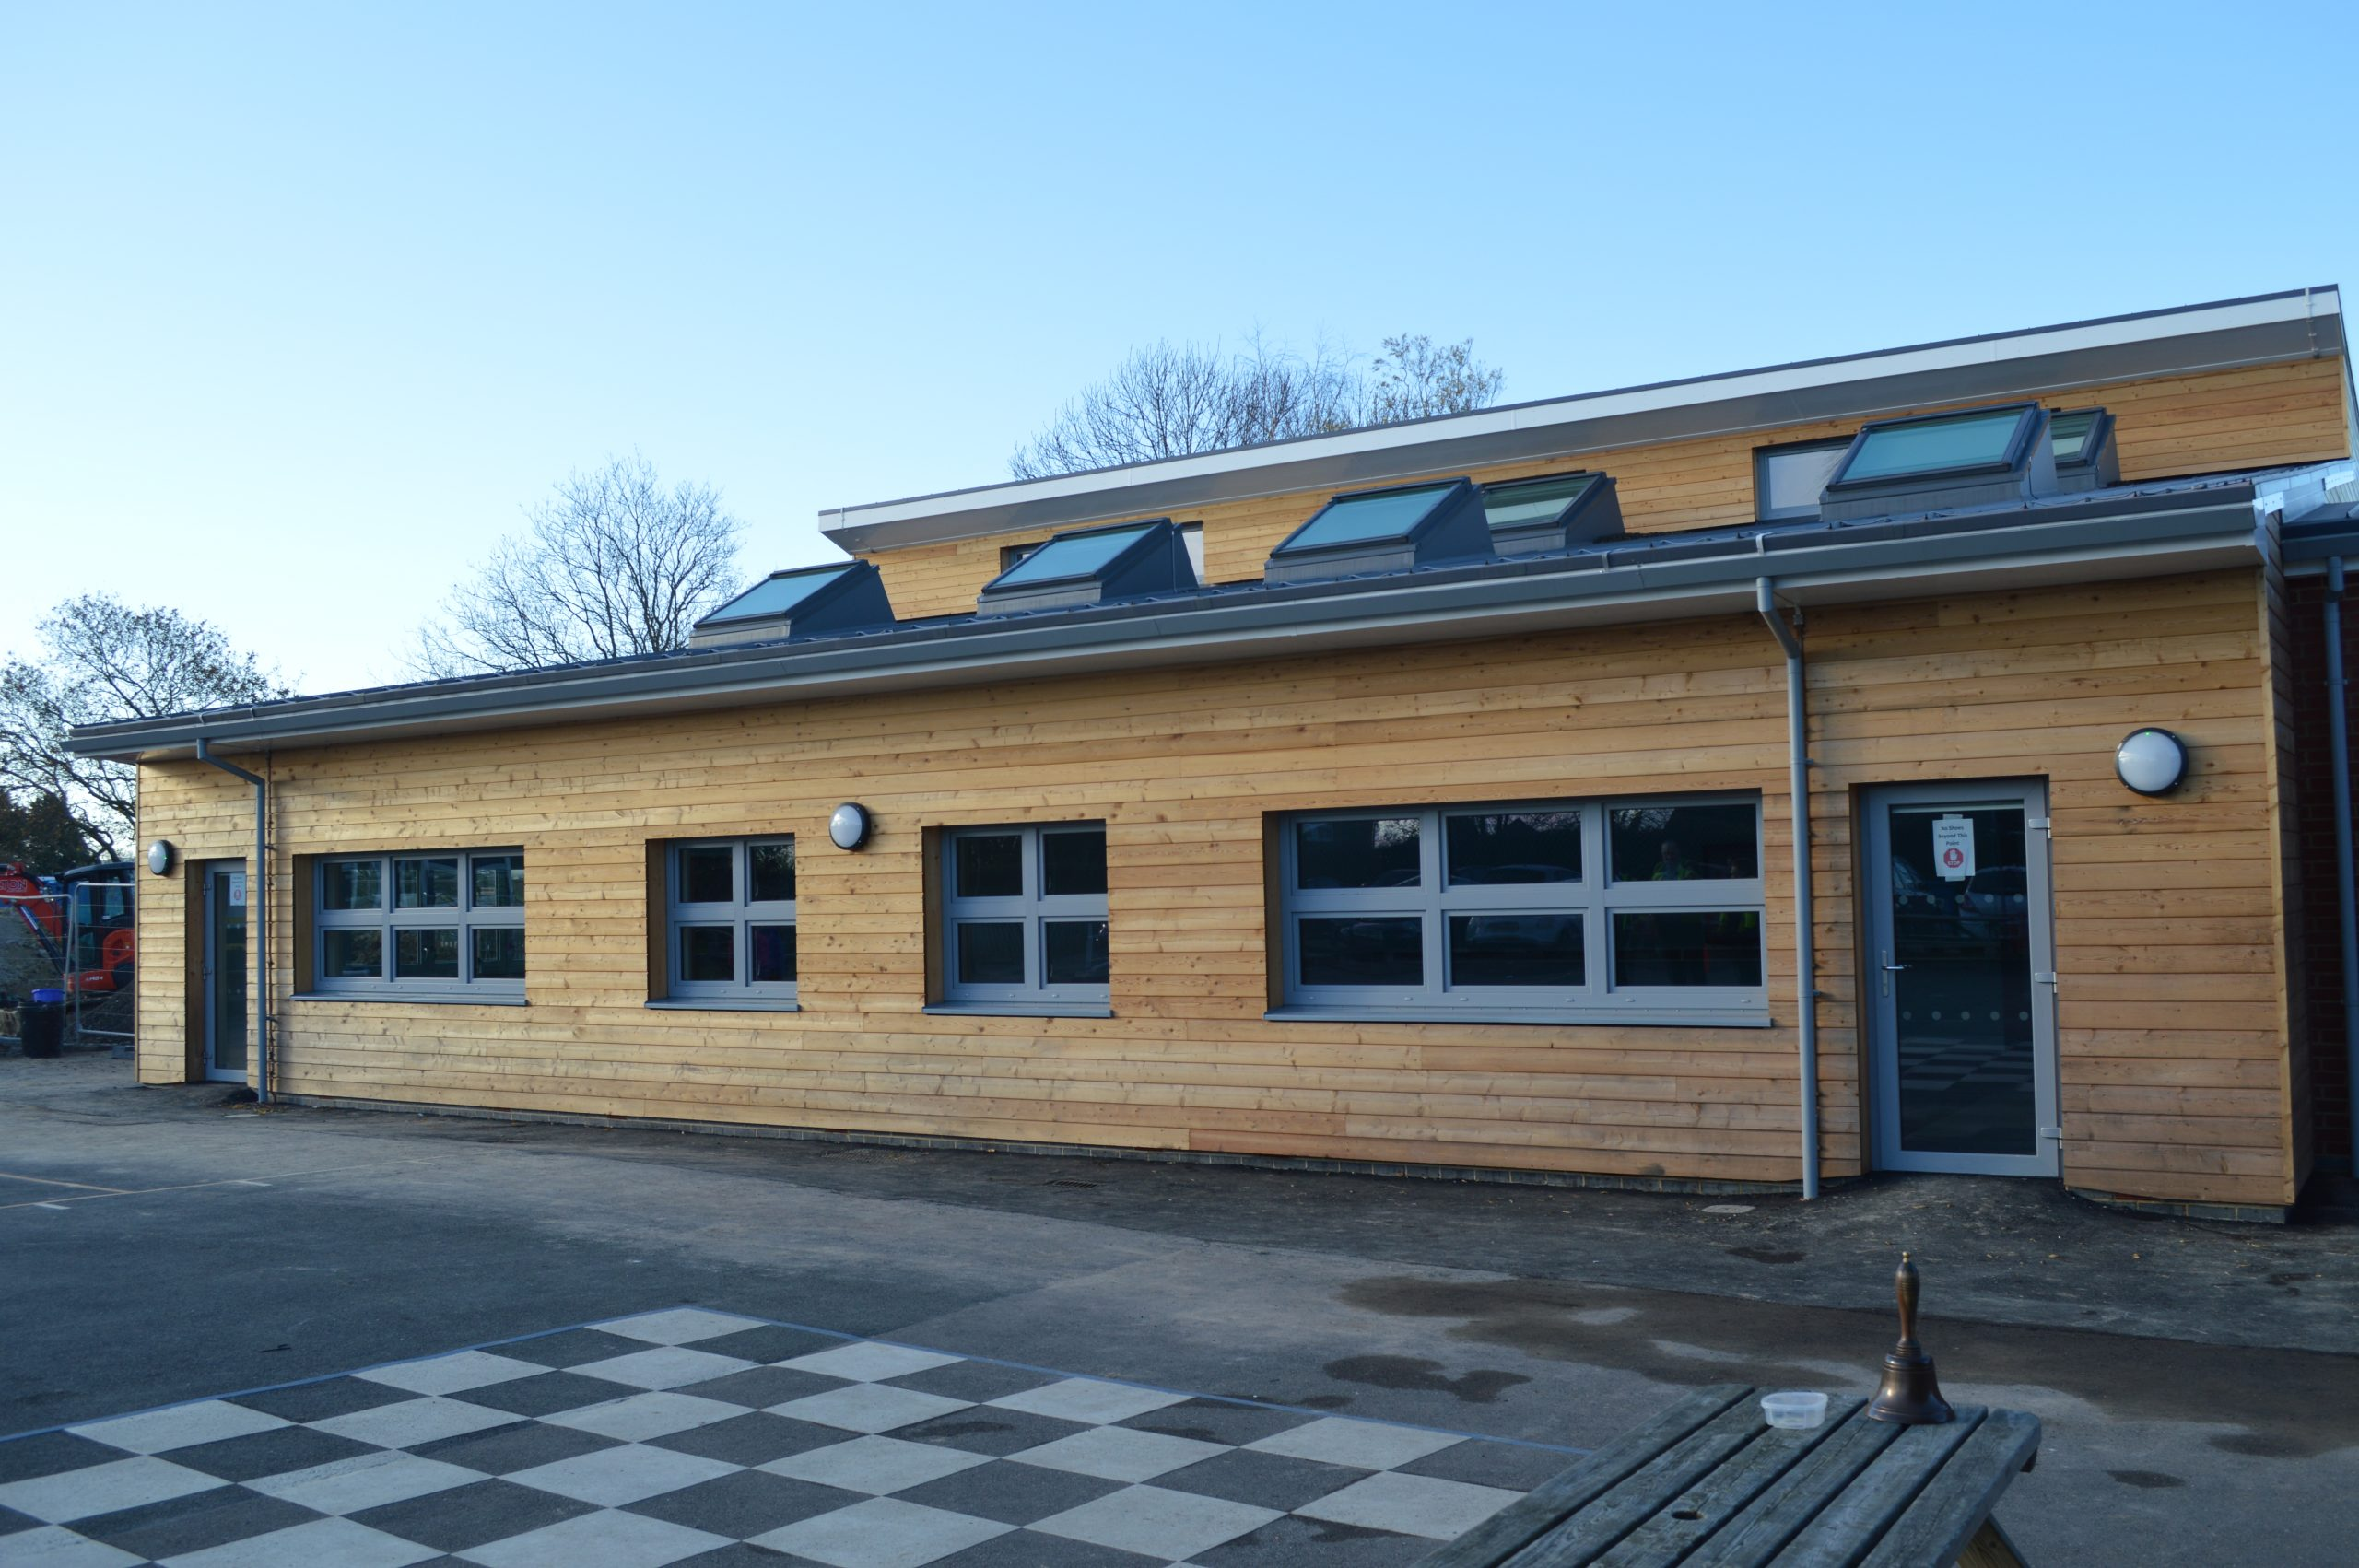 Modular build at School